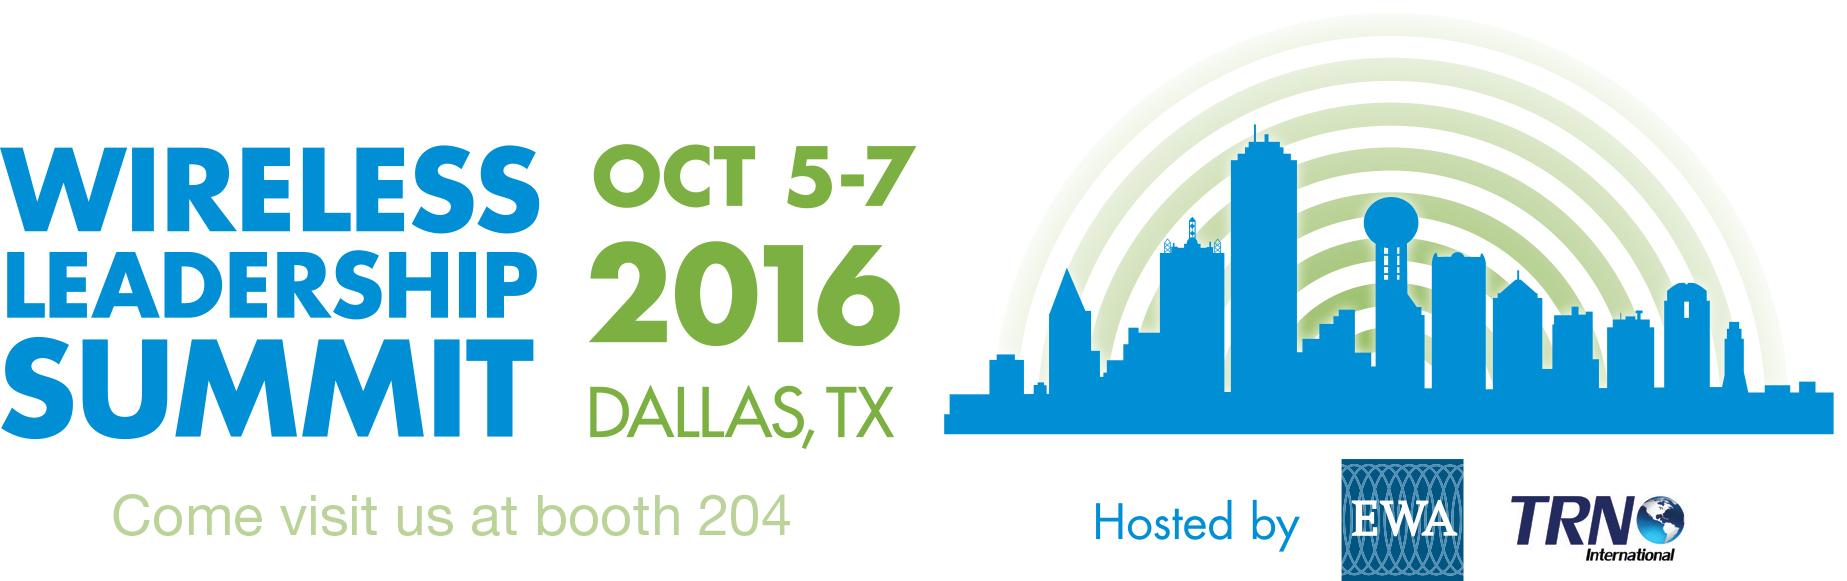 Wireless Leadership Summit